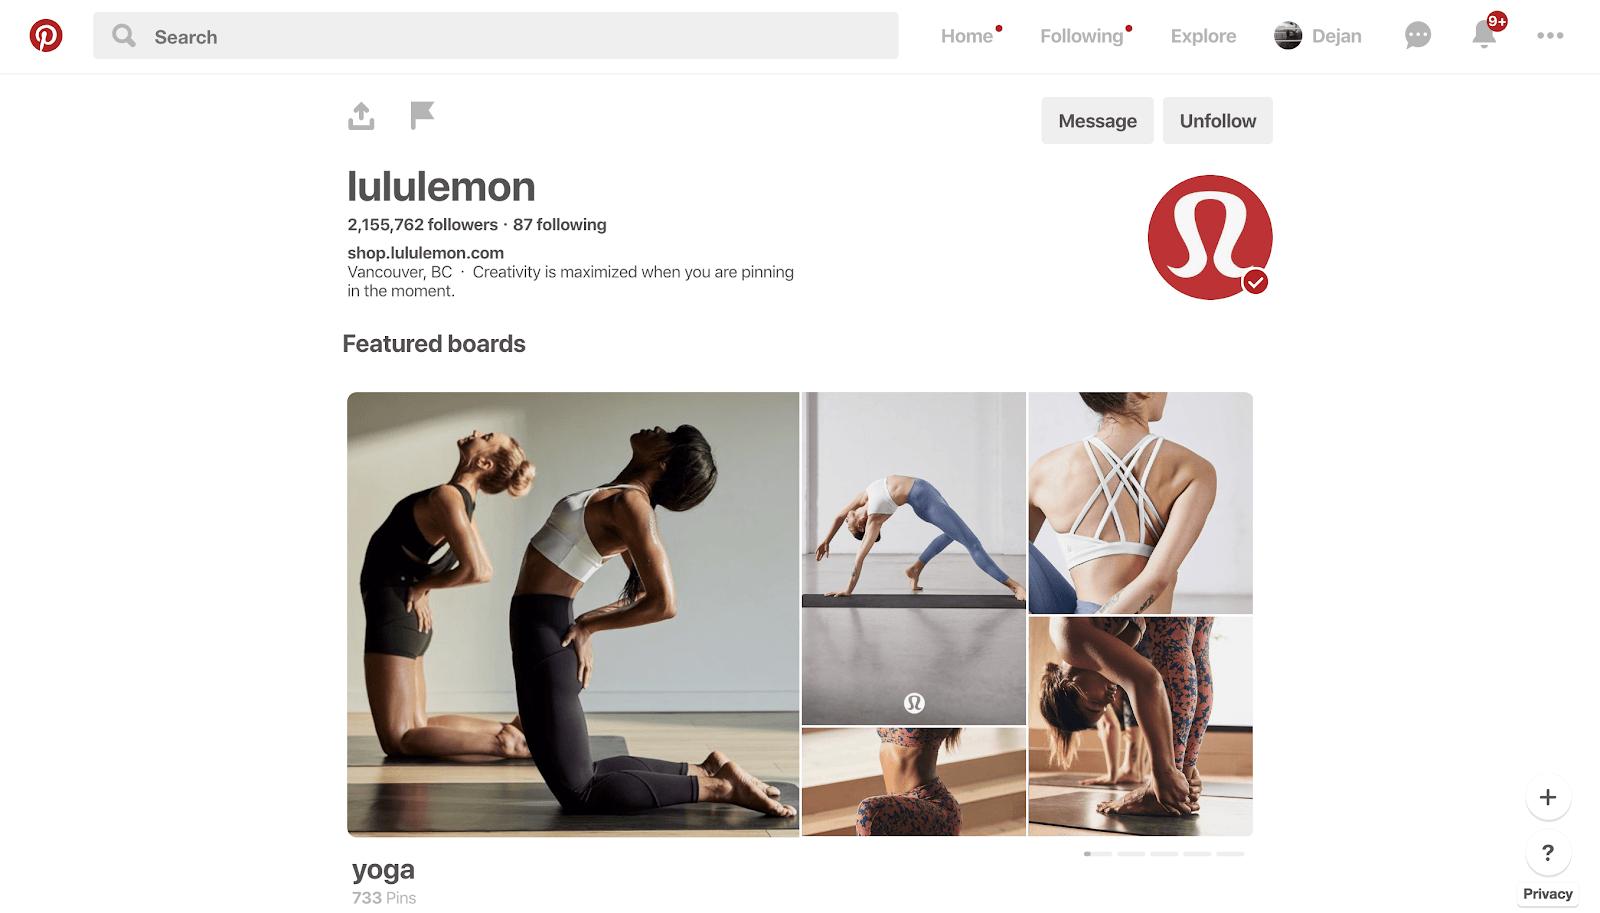 Pinterest and Lululemon - good match